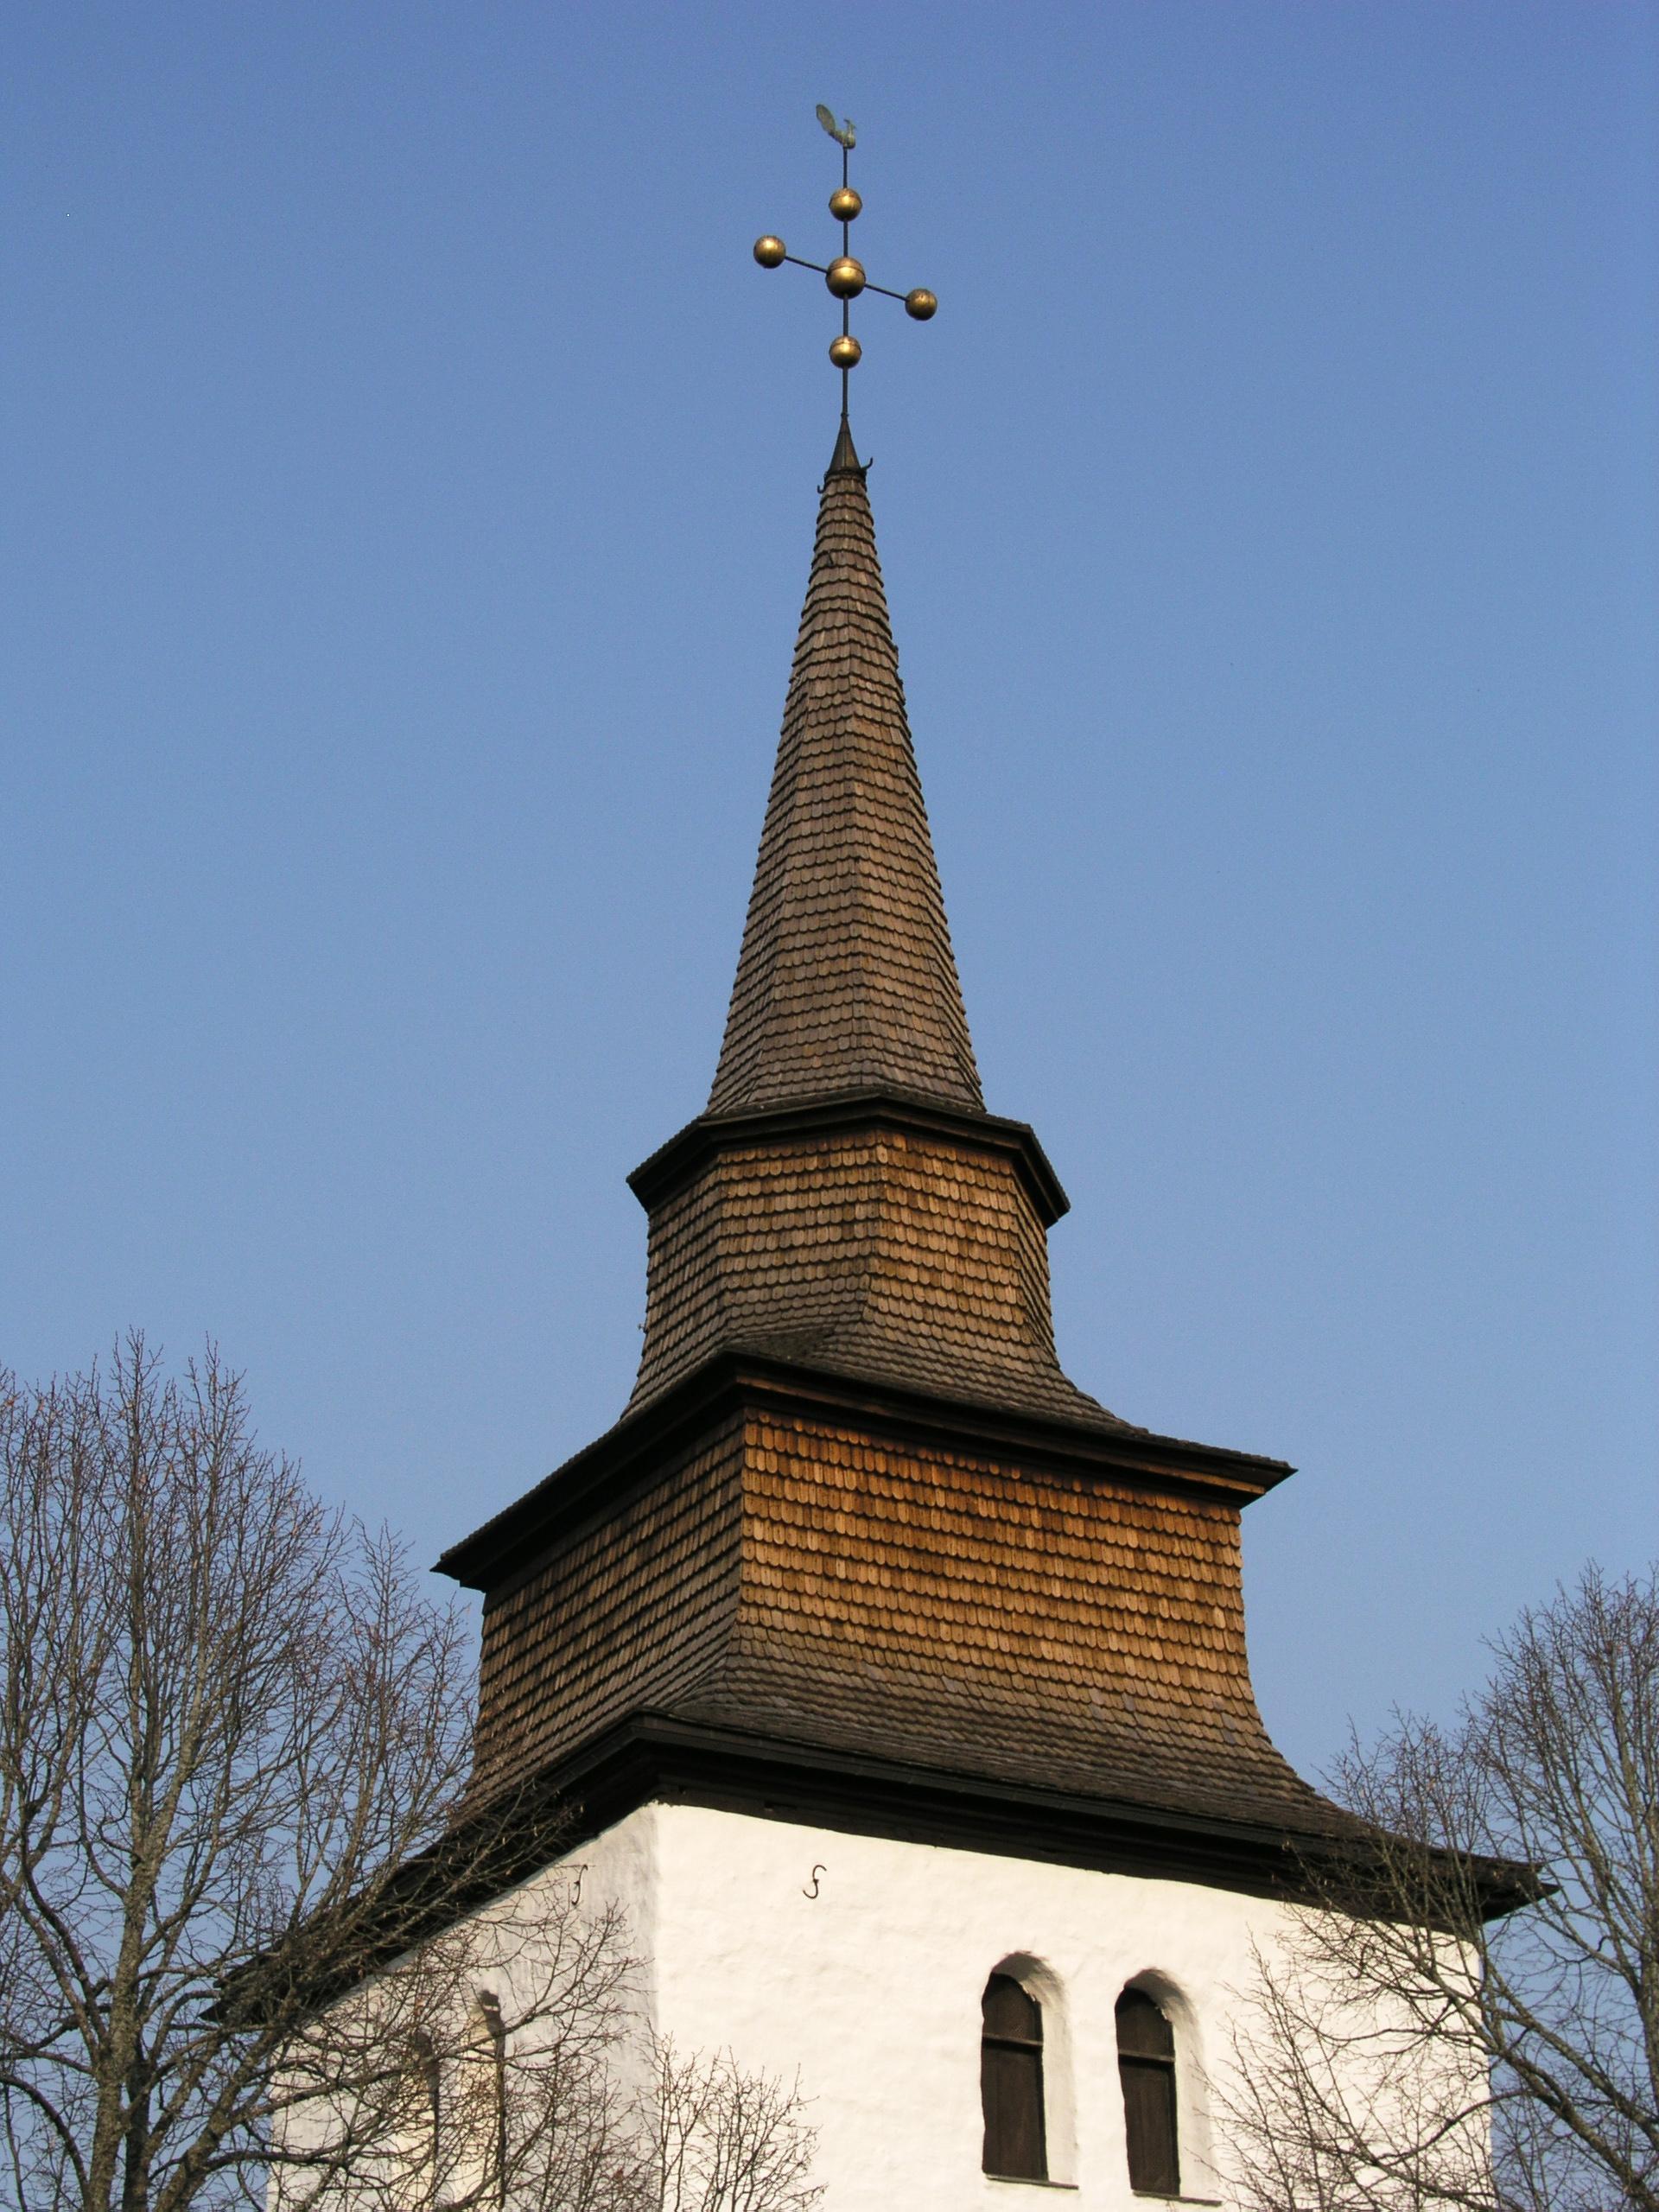 Filealga kyrka church steepleg wikimedia commons filealga kyrka church steepleg altavistaventures Images